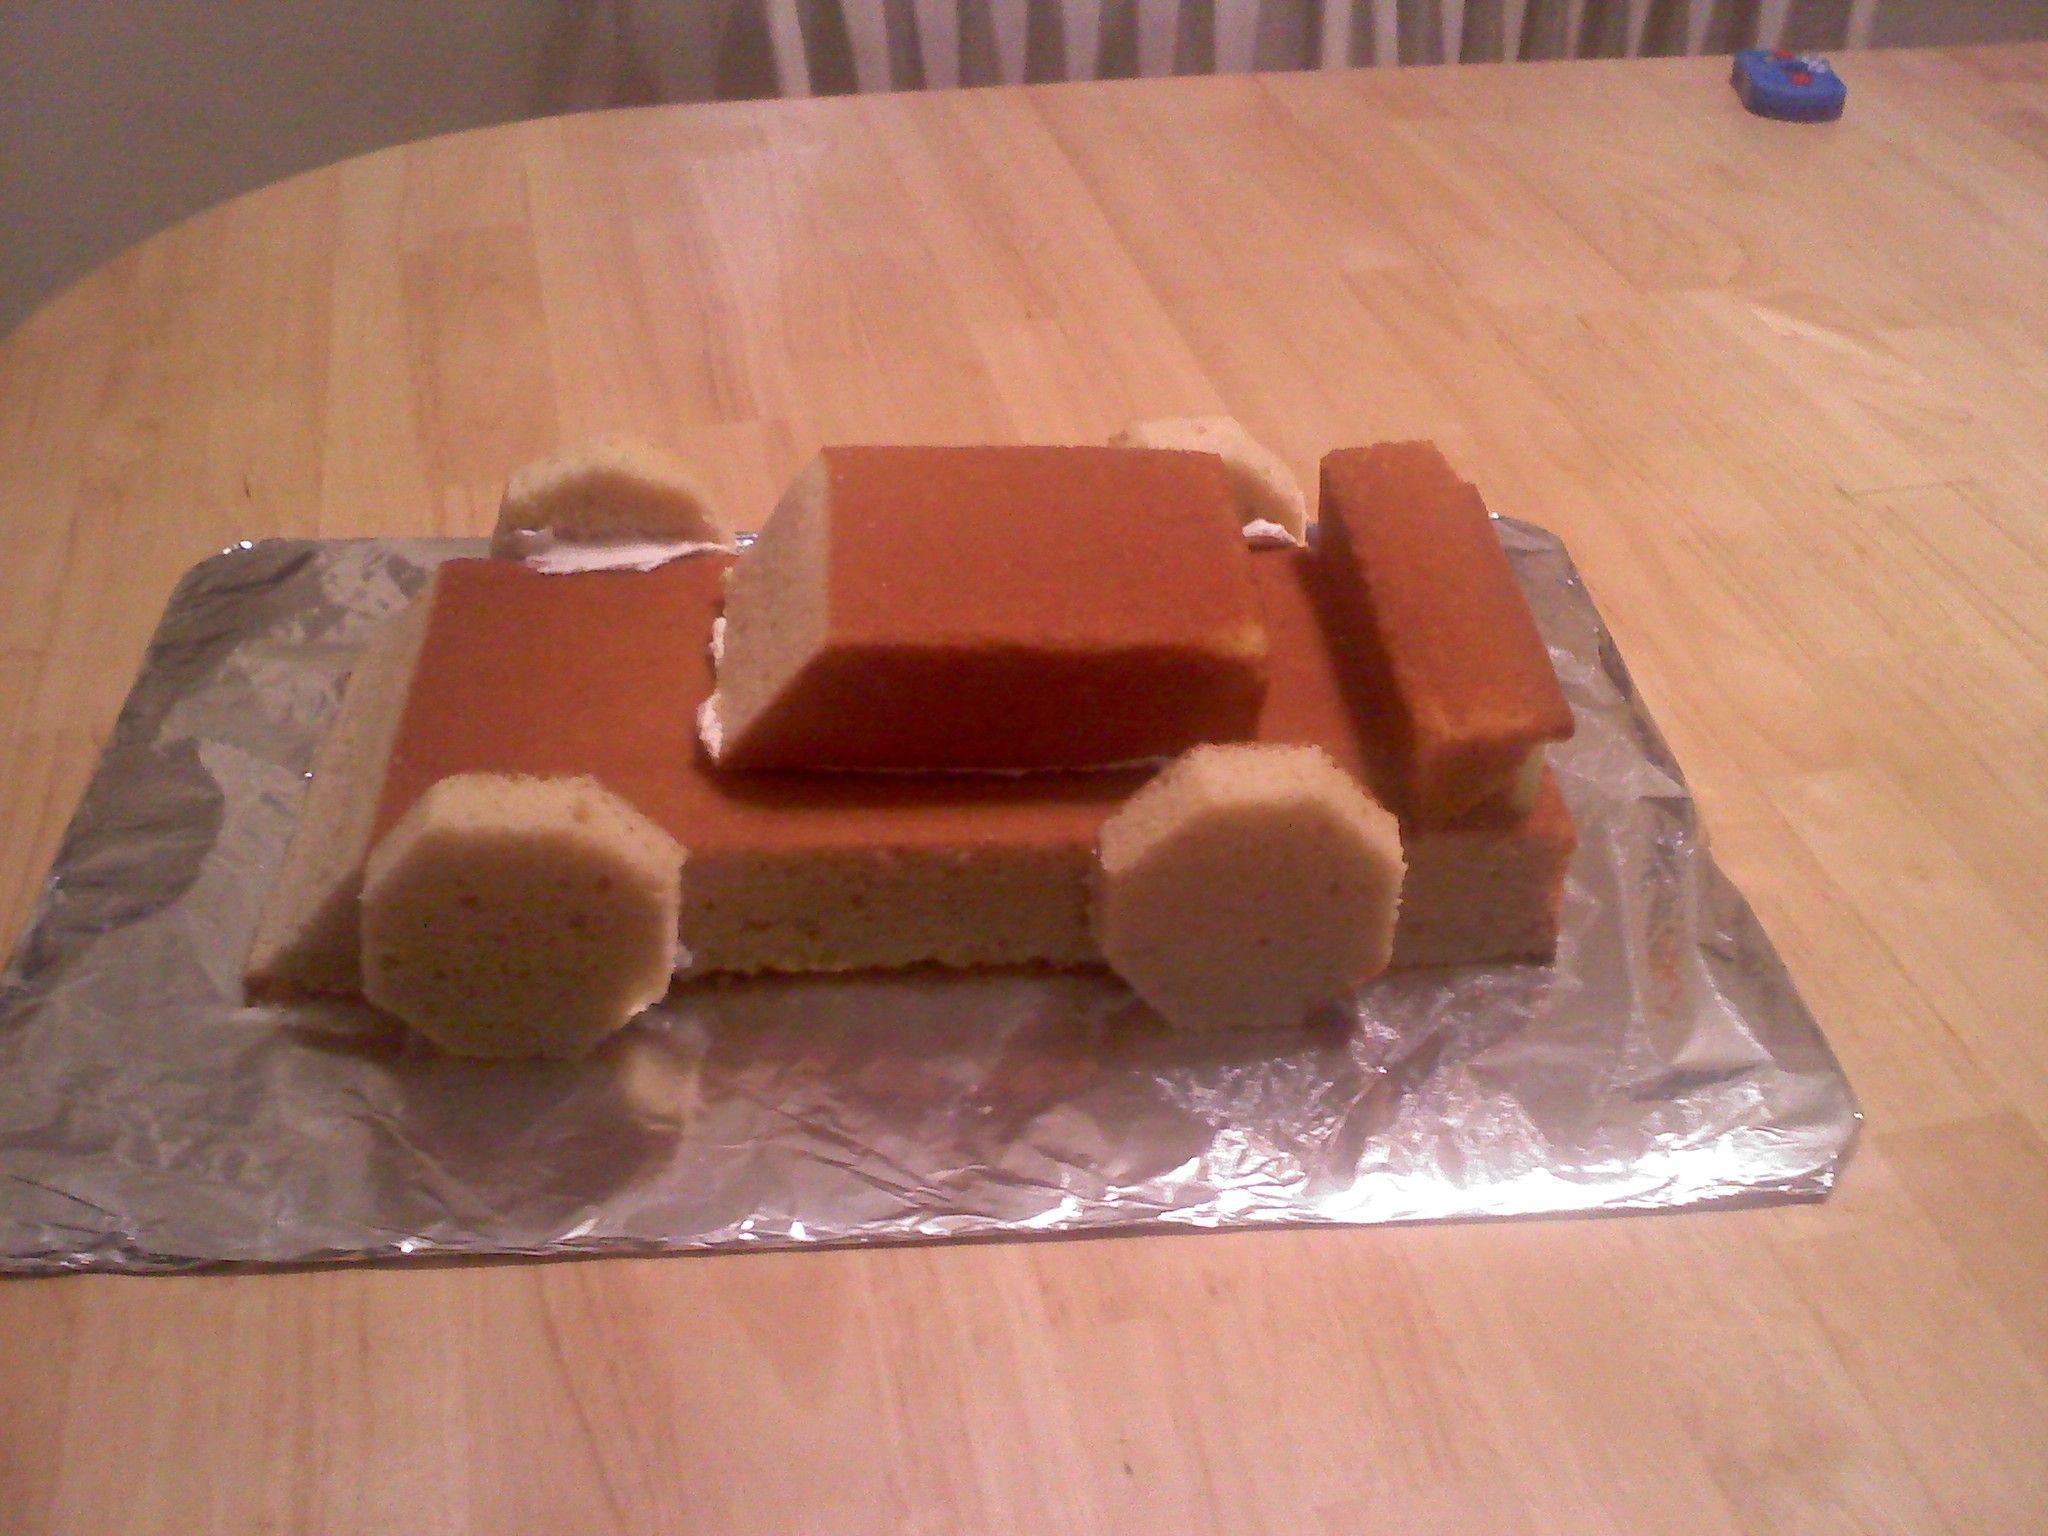 Race car cake before icing cakes pinterest car cakes cake race car cake before icing baditri Choice Image